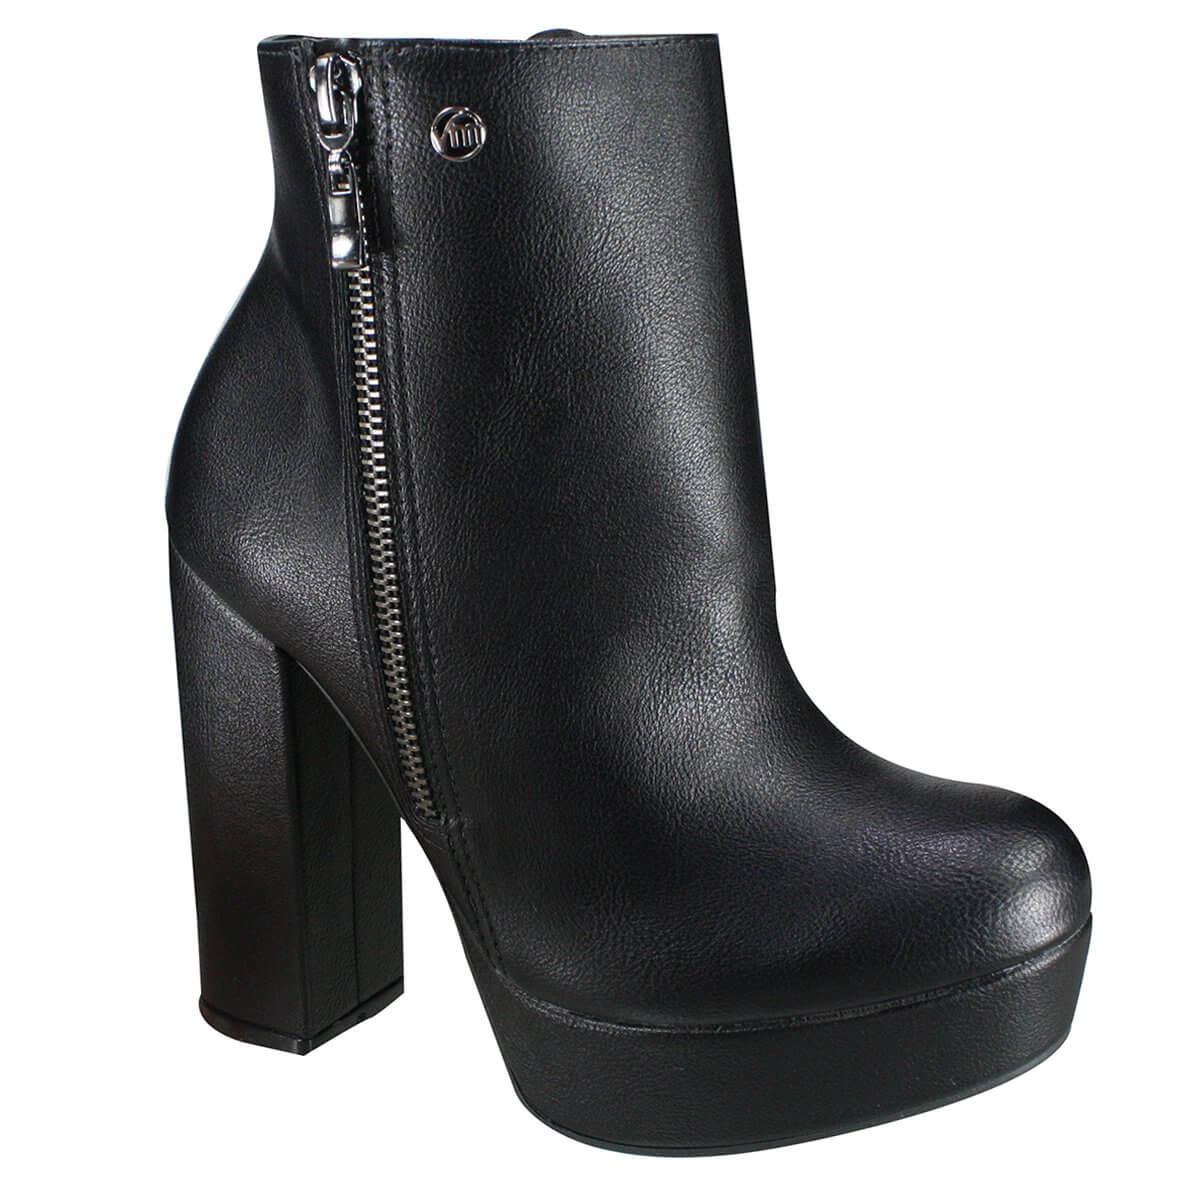 69b824e99 Bota Ankle Boot Via Marte Meia Pata 19-2204 - Preto (Napa Fenice ...